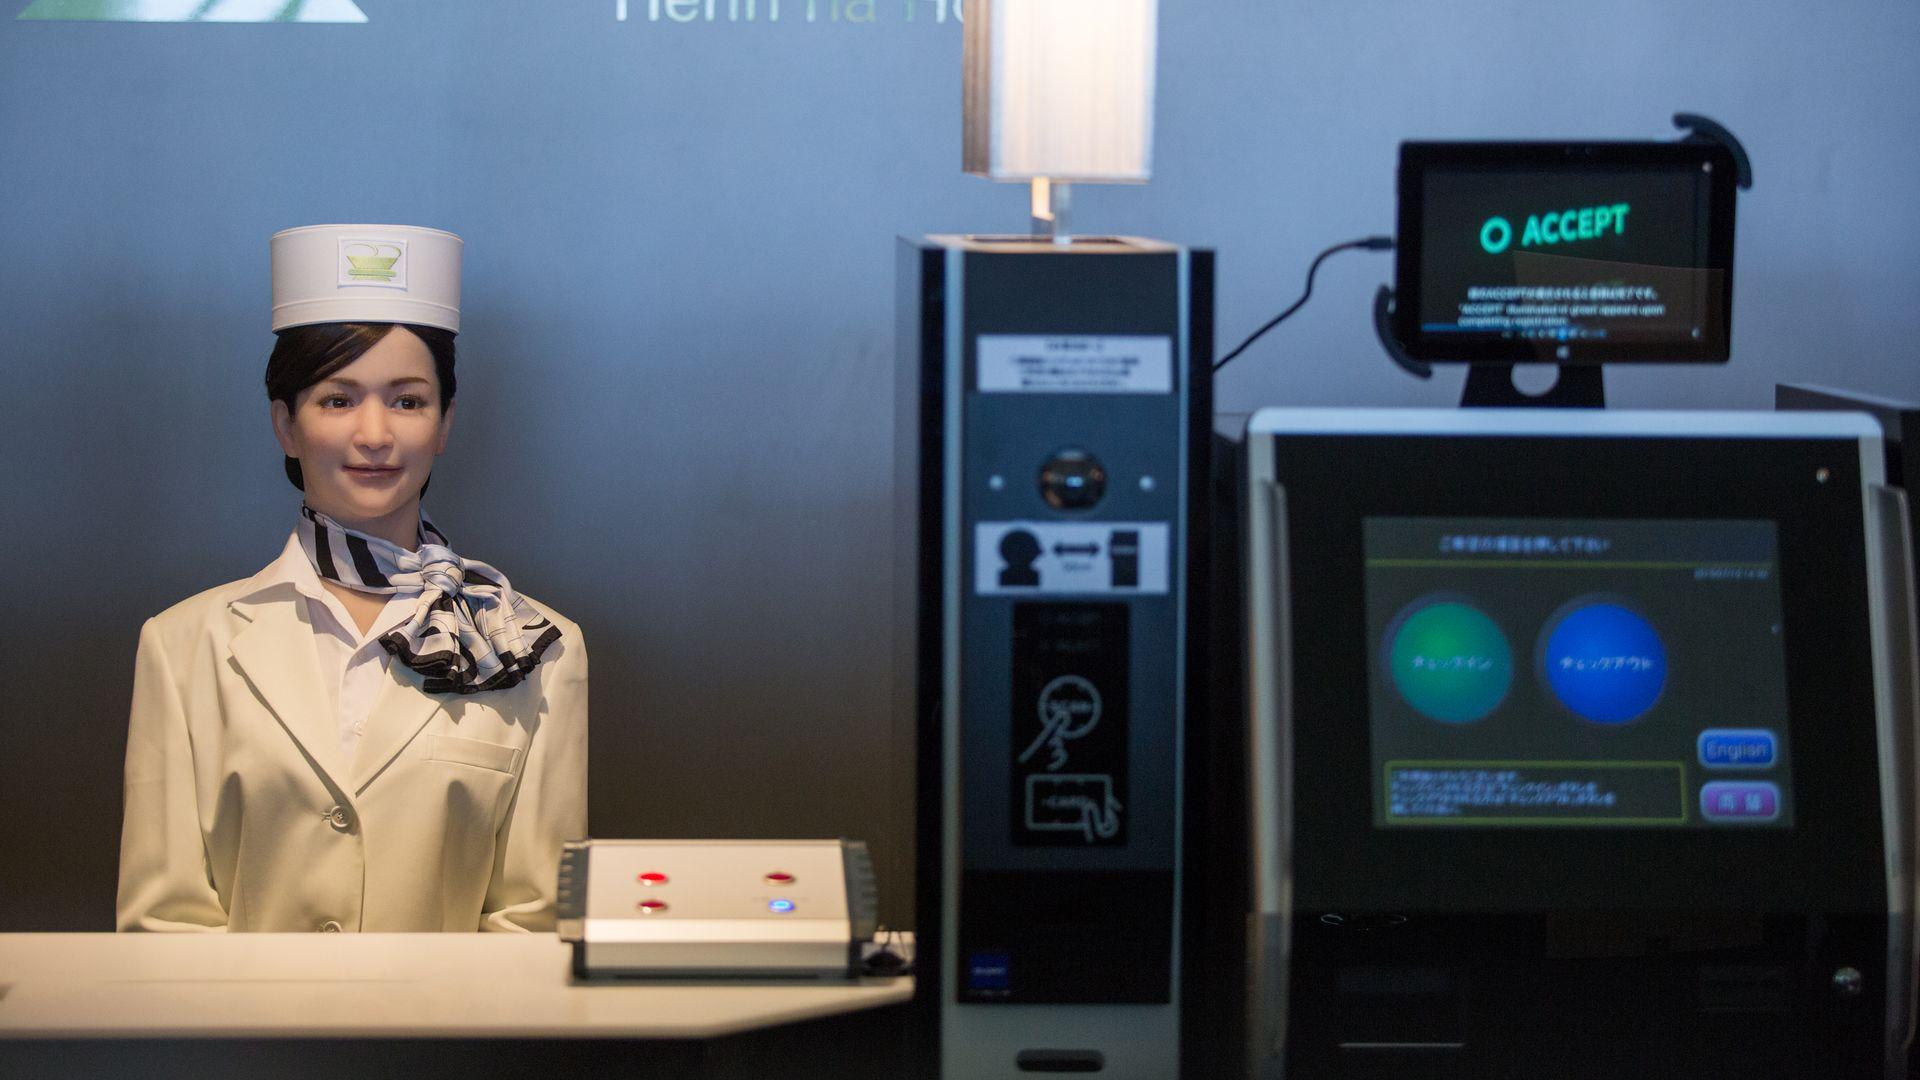 A humanoid robot at the Henna Hotel (Weird Hotel) in Huis Ten Bosch, Netherlands.